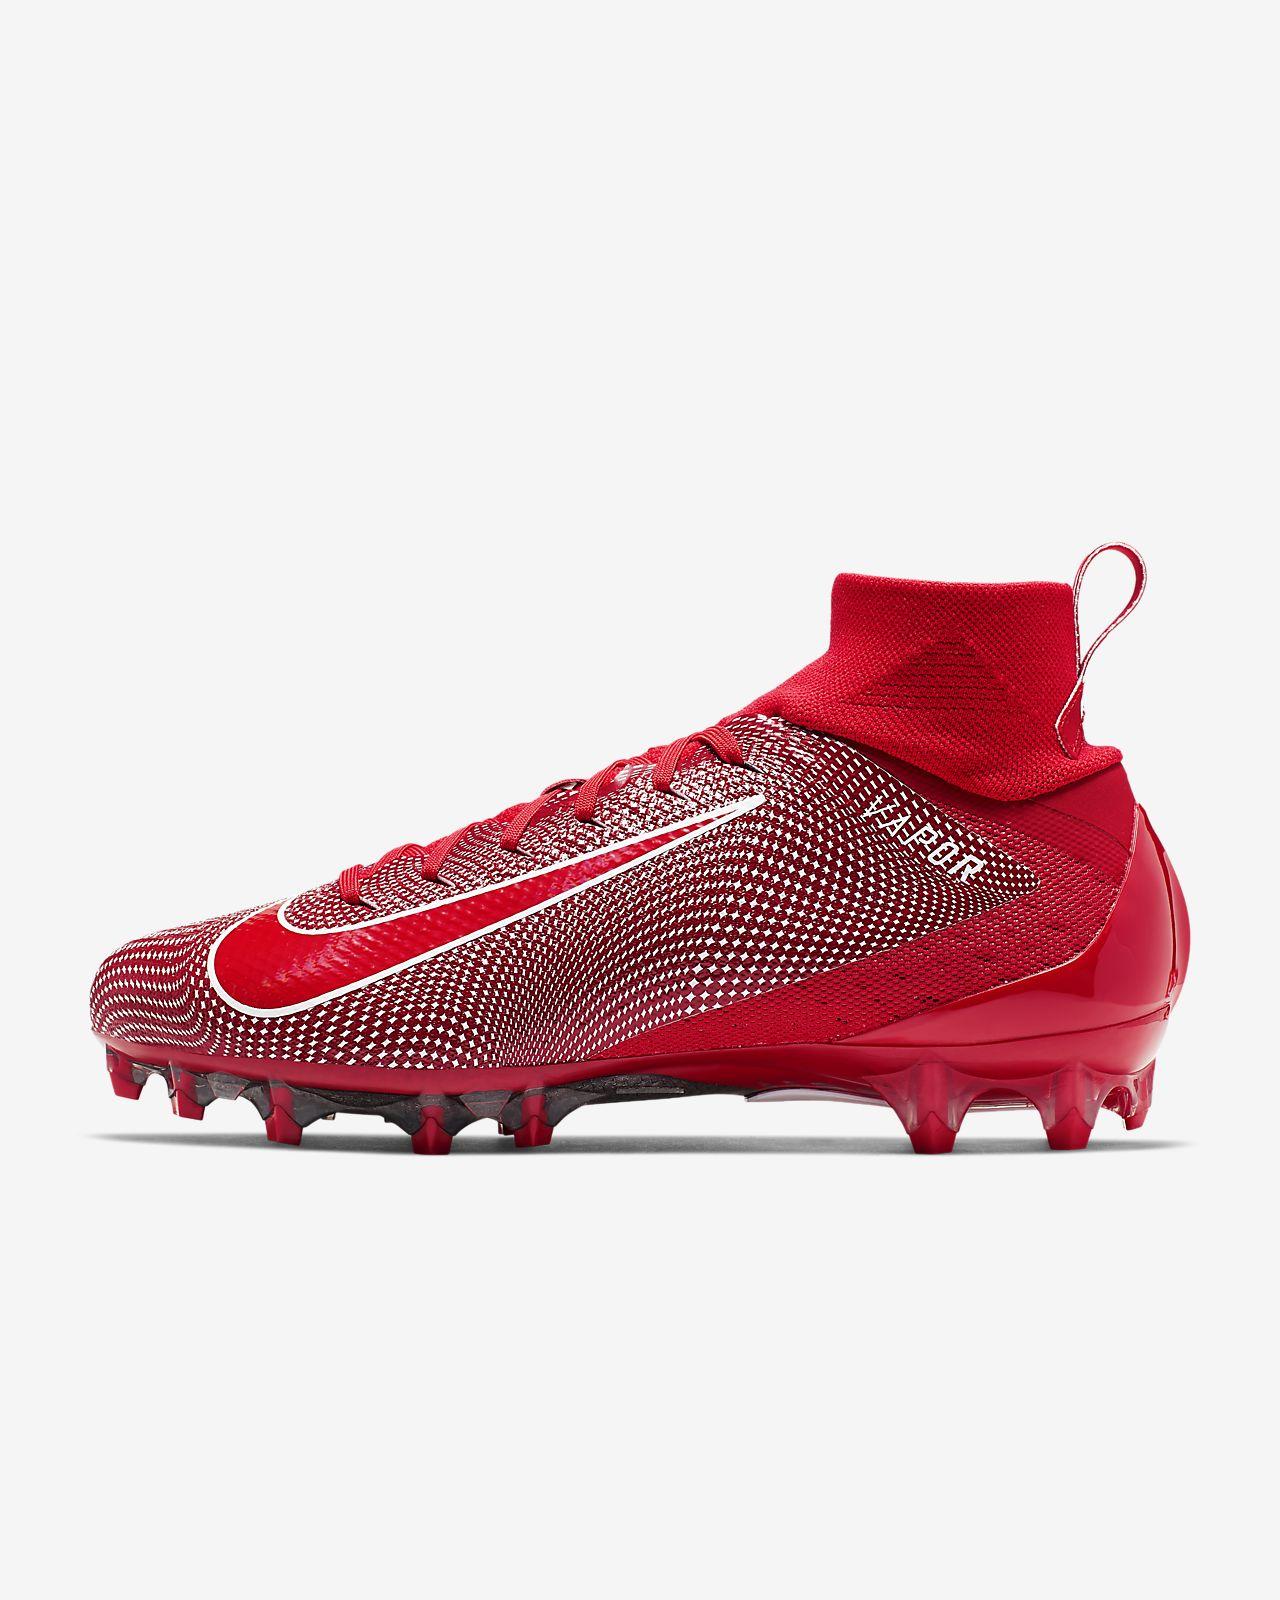 2d7200b28 Nike Vapor Untouchable 3 Pro Football Cleat. Nike.com